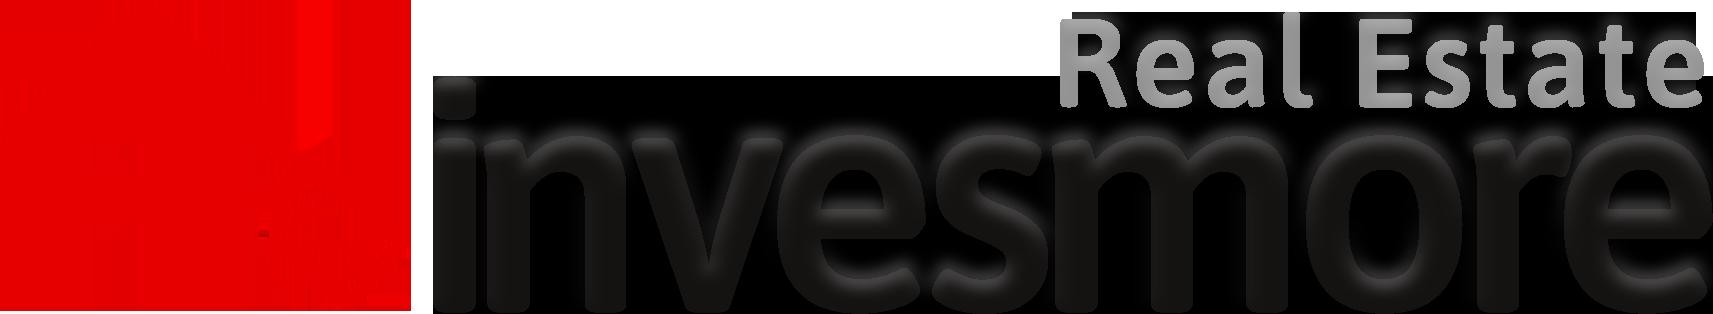 invesmore real estate logo 1-1